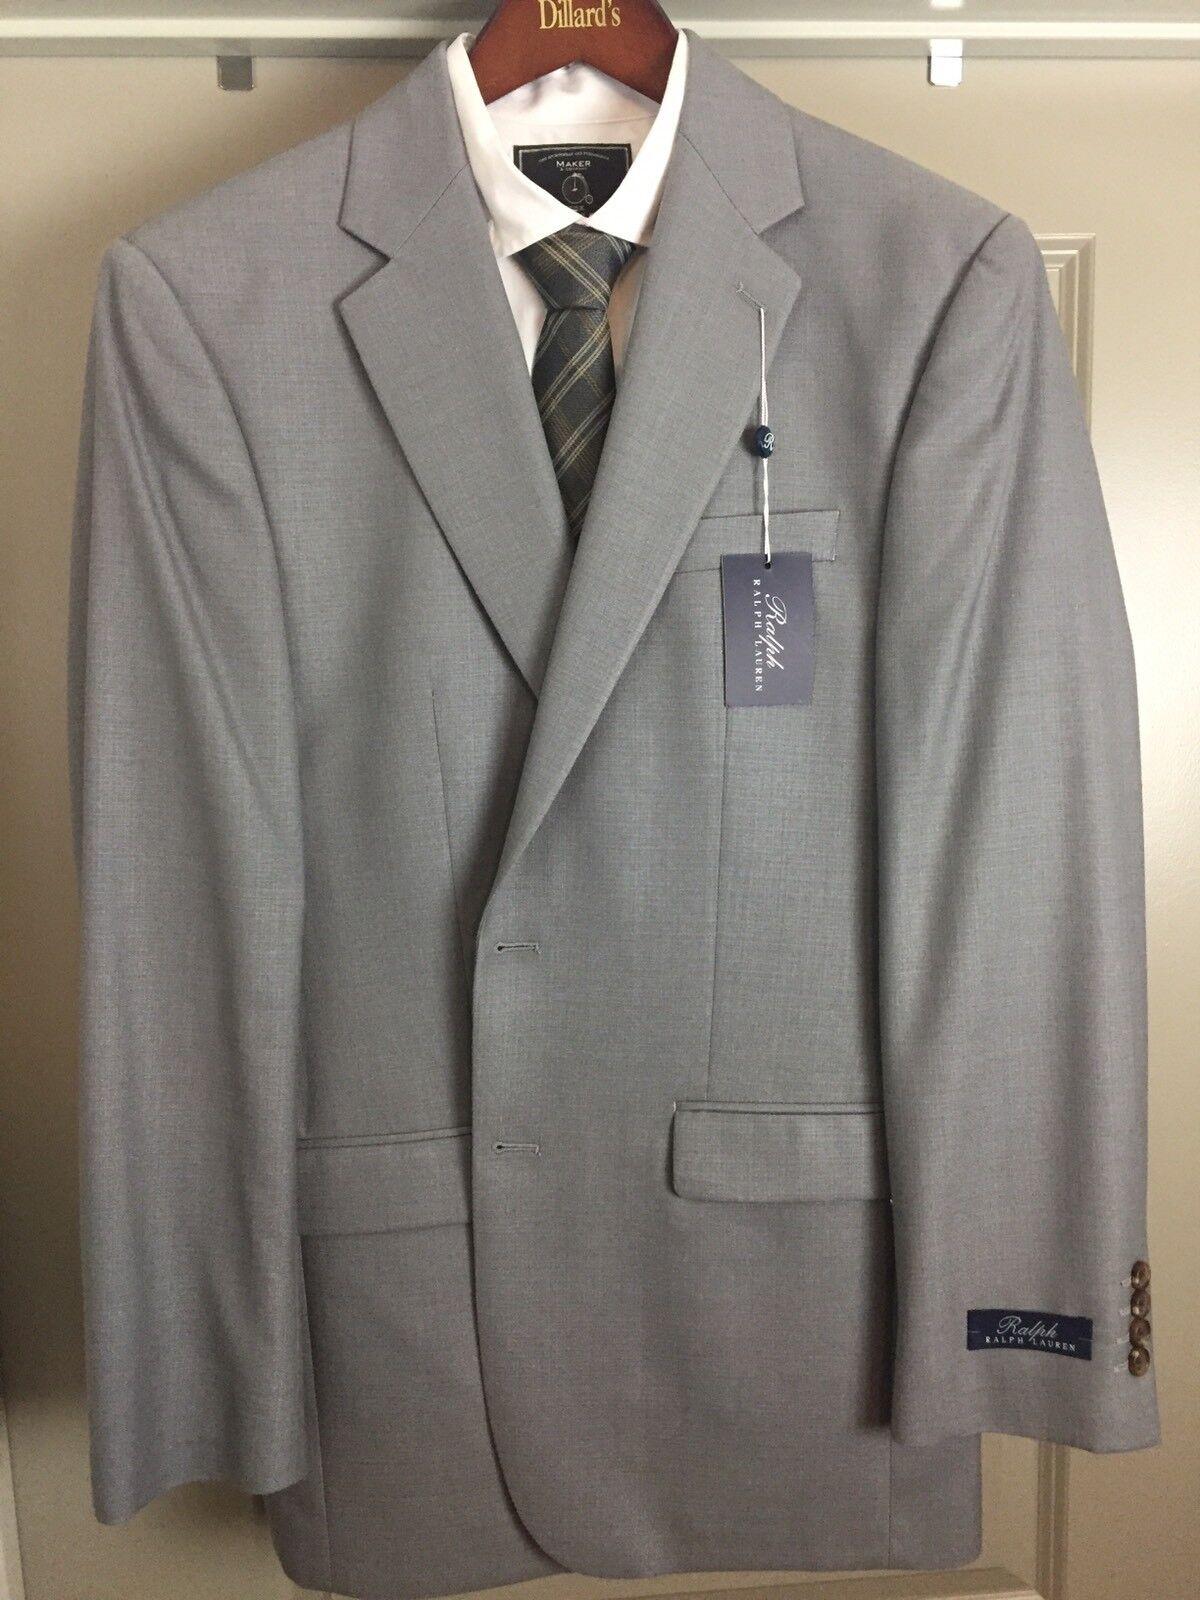 NWT RALPH BY RALPH LAUREN Light grau 40L Reg Fit SPORT COAT Silk Wool MSRP295